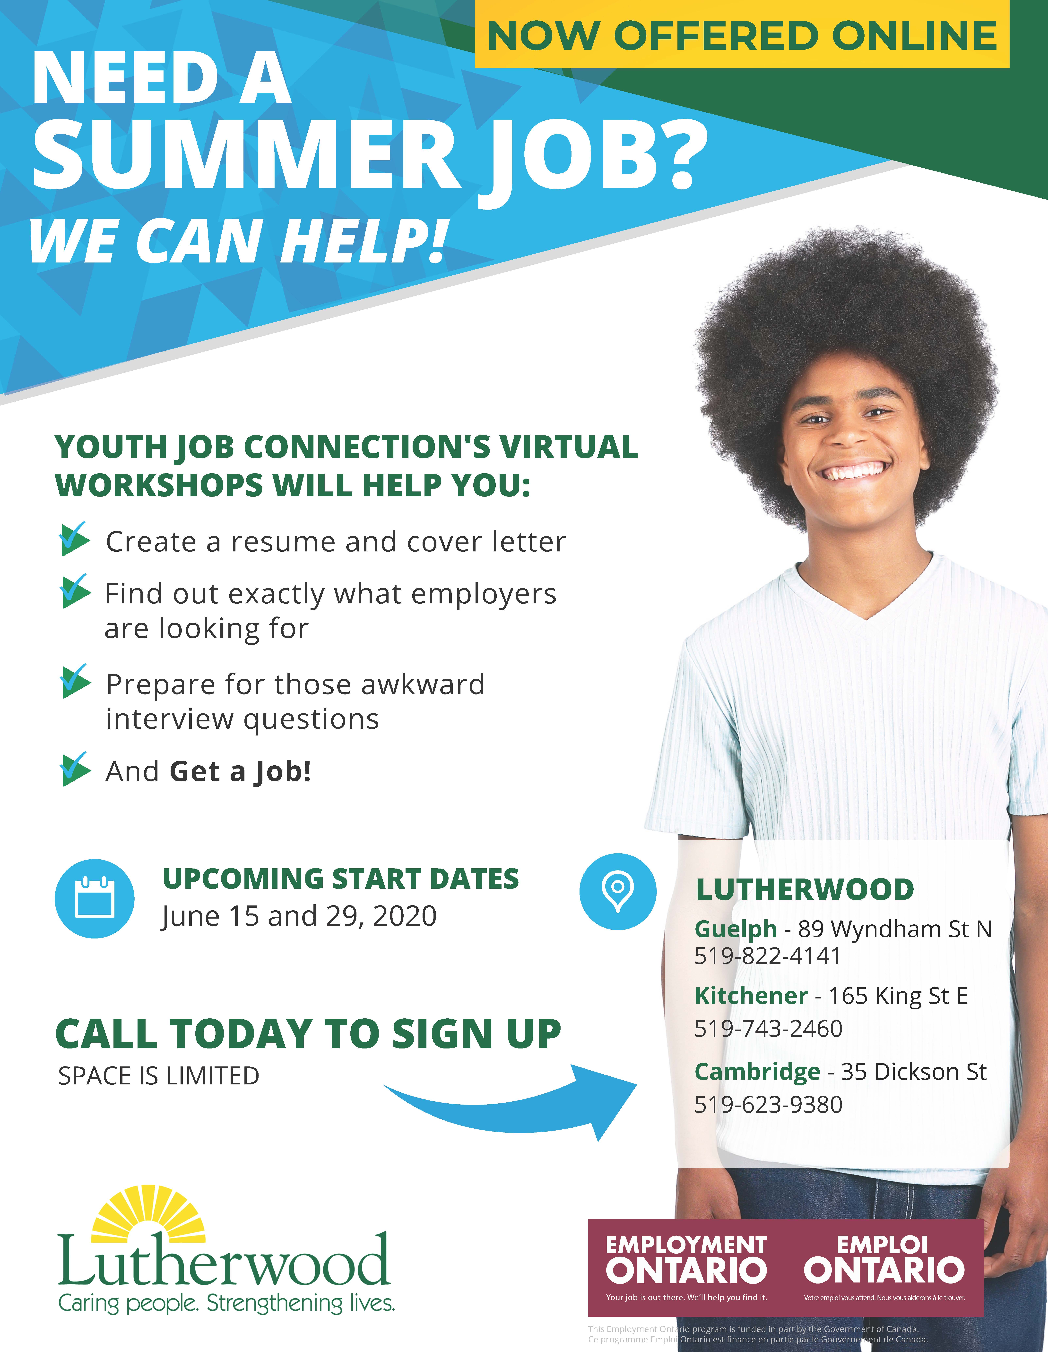 YJC Summer Poster - June Workshop Dates Cambridge